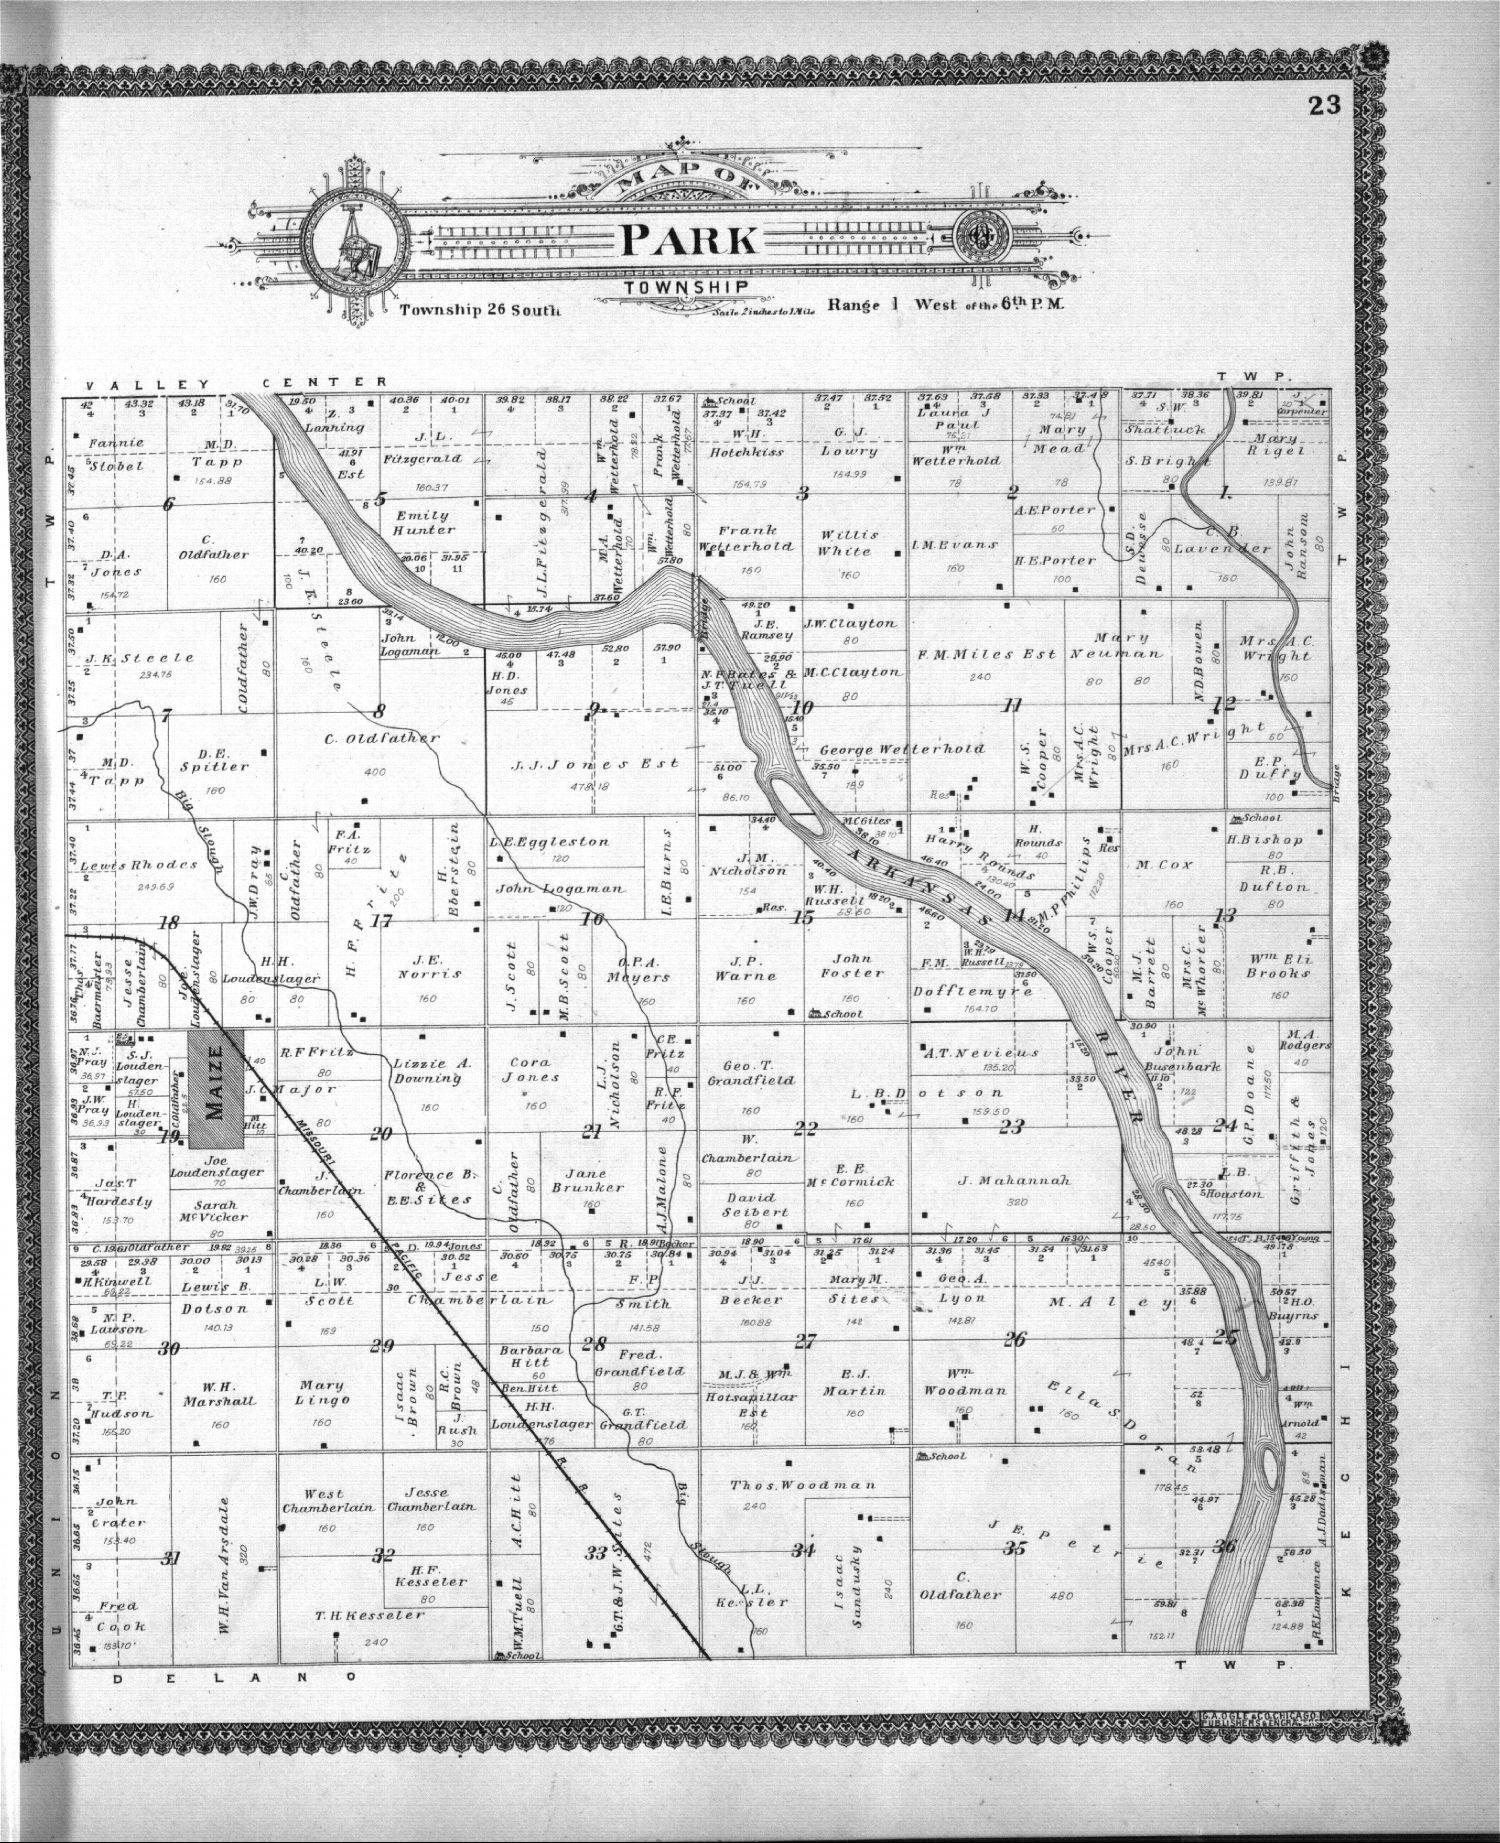 Standard atlas of Sedgwick County, Kansas - 23